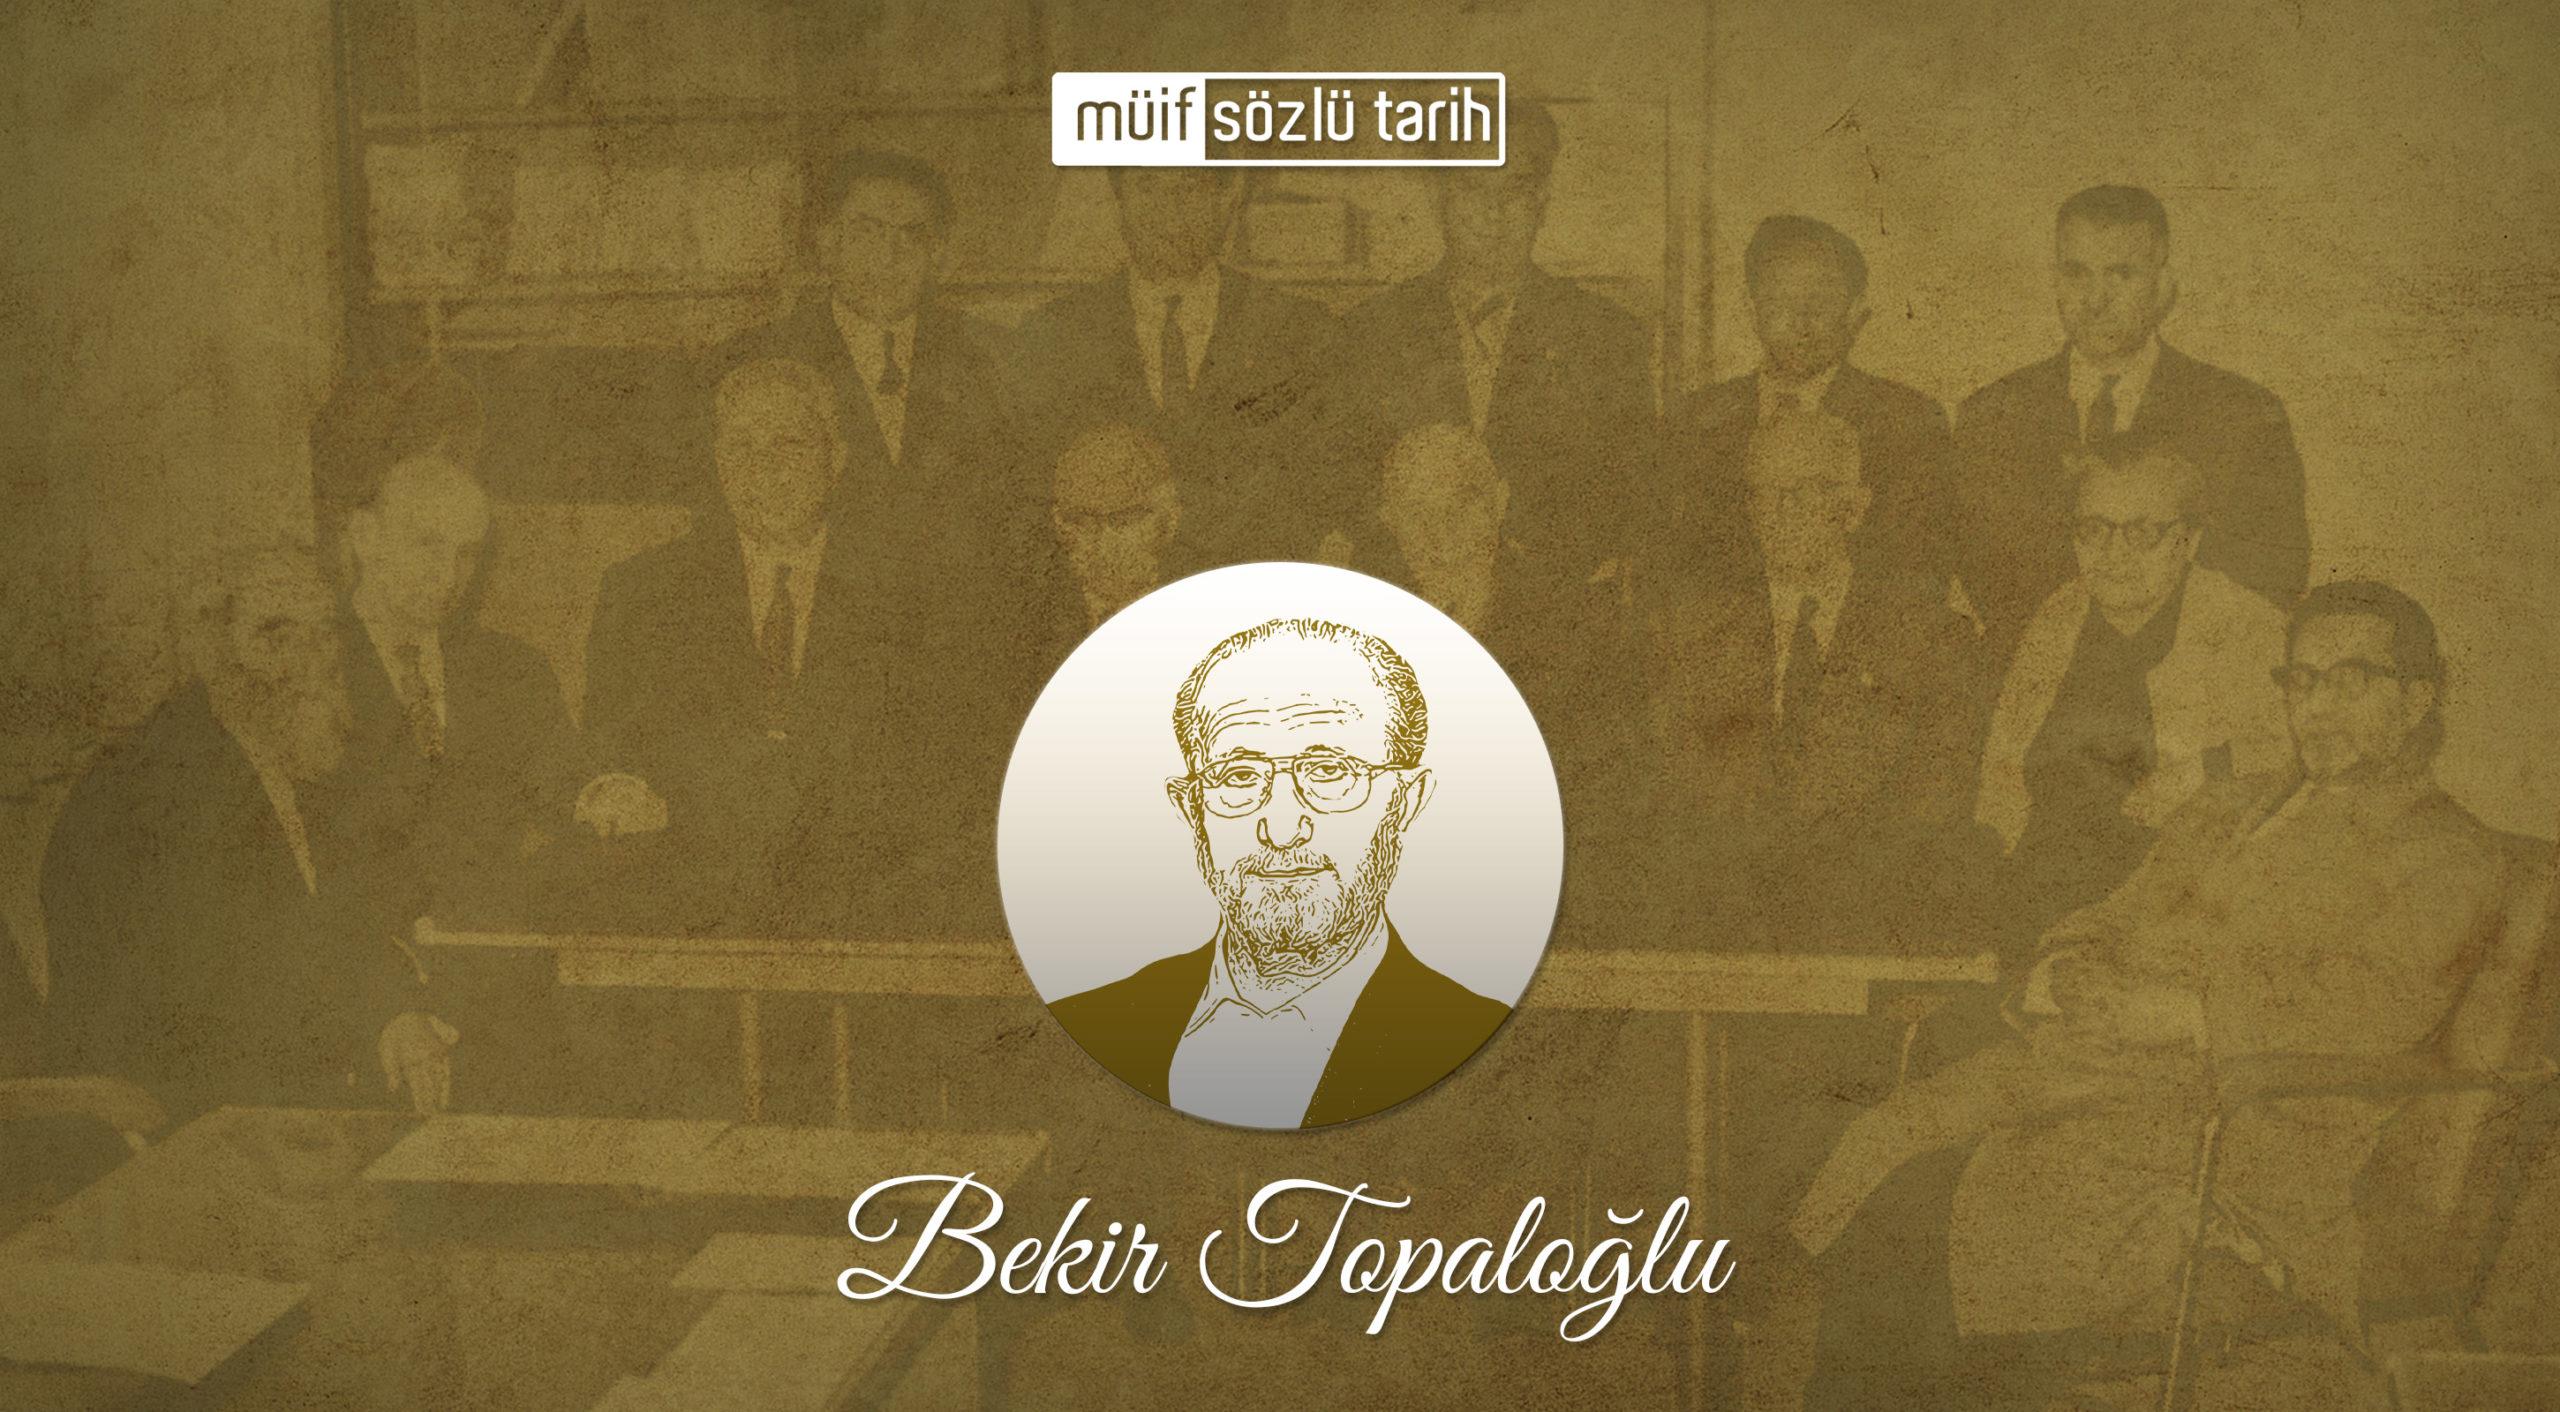 Prof. Dr. Bekir Topaloğlu